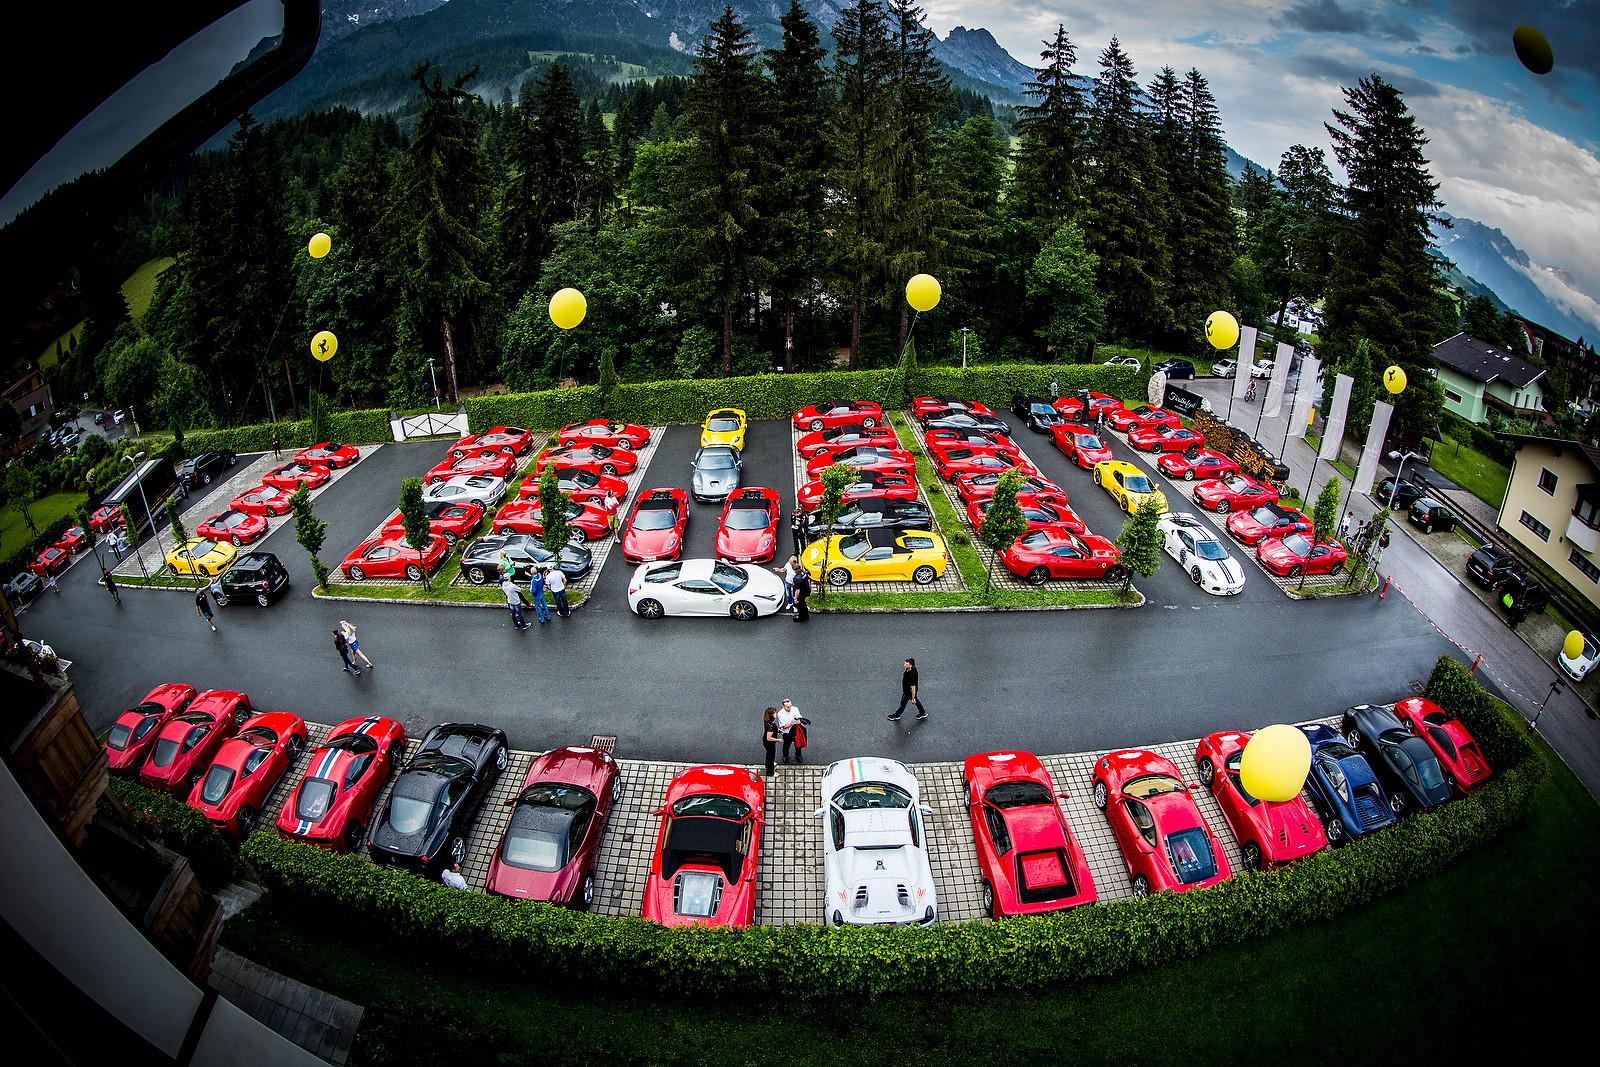 PIT BITS - Leogang World Cup - Media Parking - PIT BITS - Leogang World Cup Downhill - Mountain Biking Pictures - Vital MTB